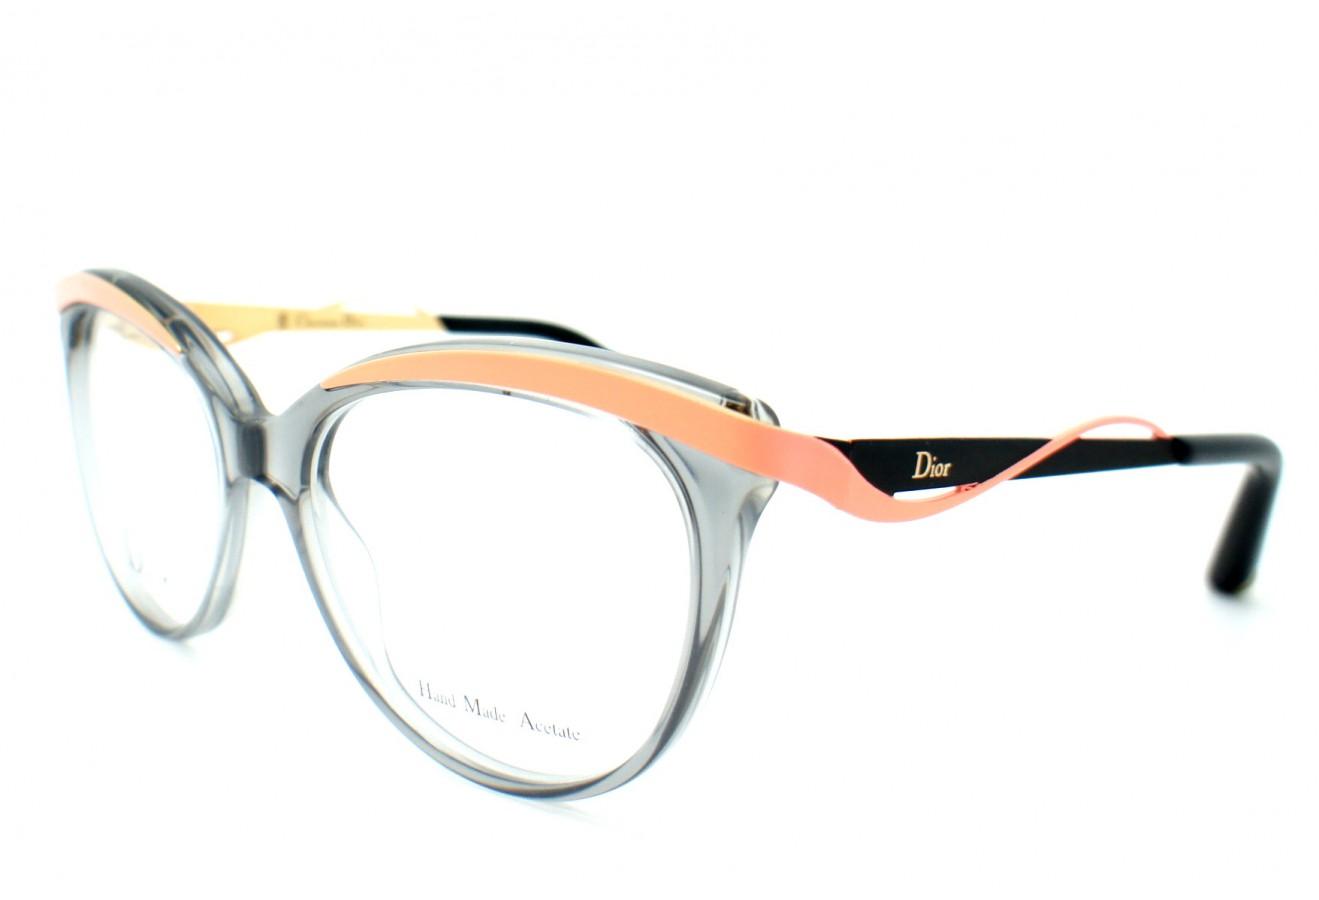 lunettes de vue femme tendance 2013. Black Bedroom Furniture Sets. Home Design Ideas